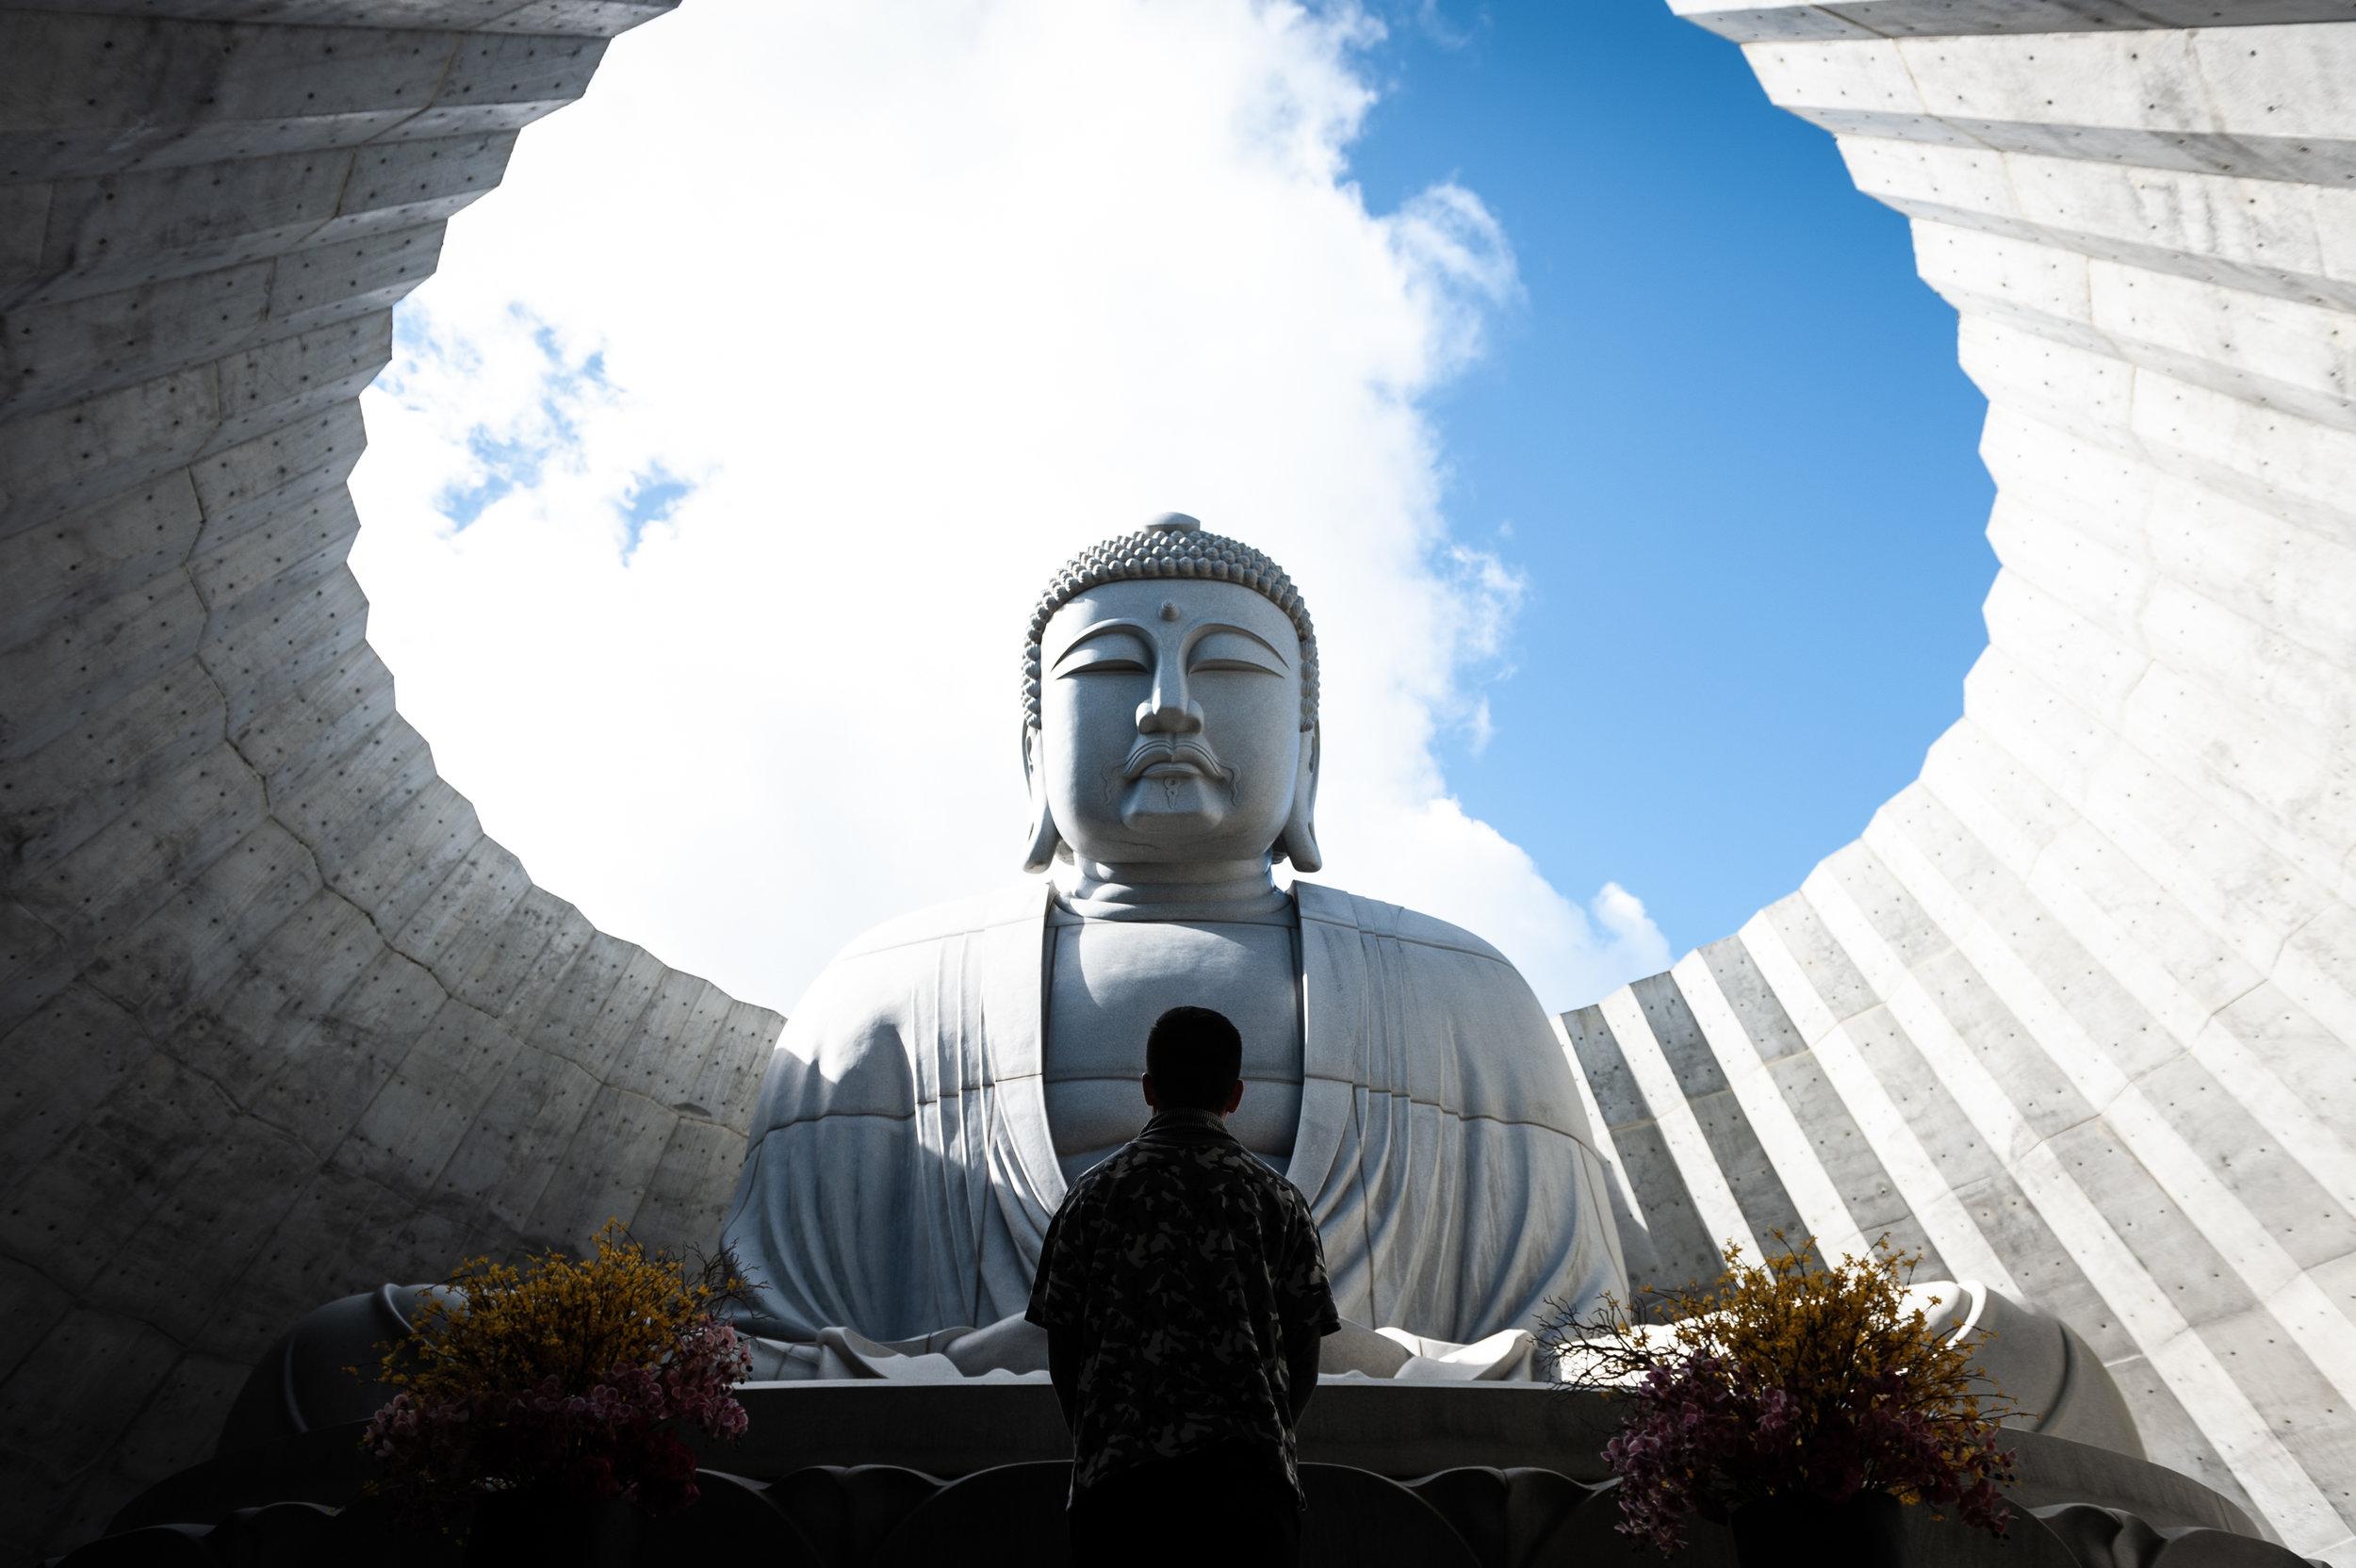 Photo by: Shoot My Travel Photographer  Daisuke  in Sapporo